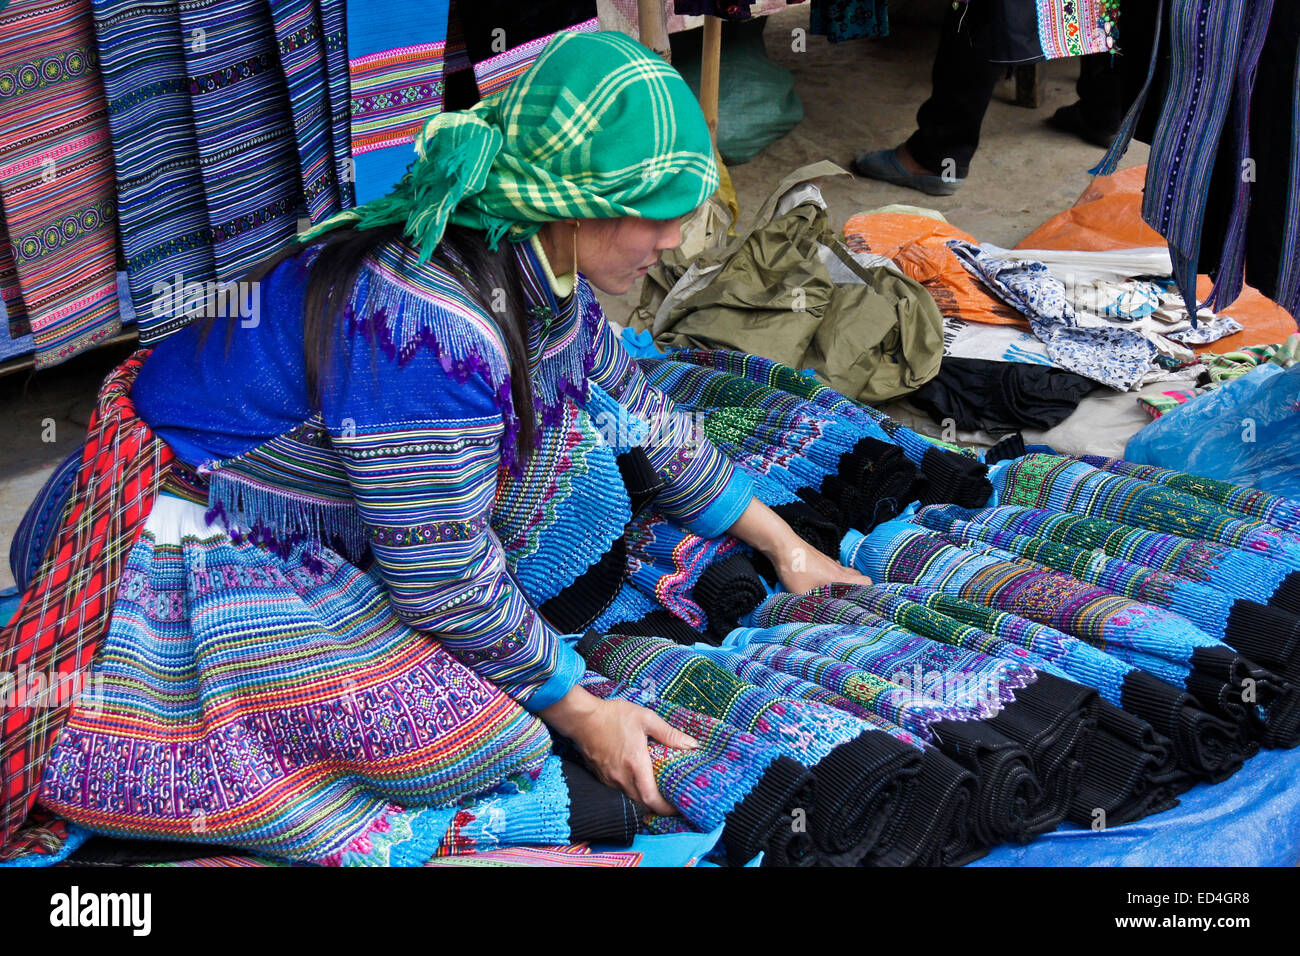 Flower Hmong woman selling pleated skirts at Sunday Market, Bac Ha, Sapa (Sa Pa), Vietnam - Stock Image